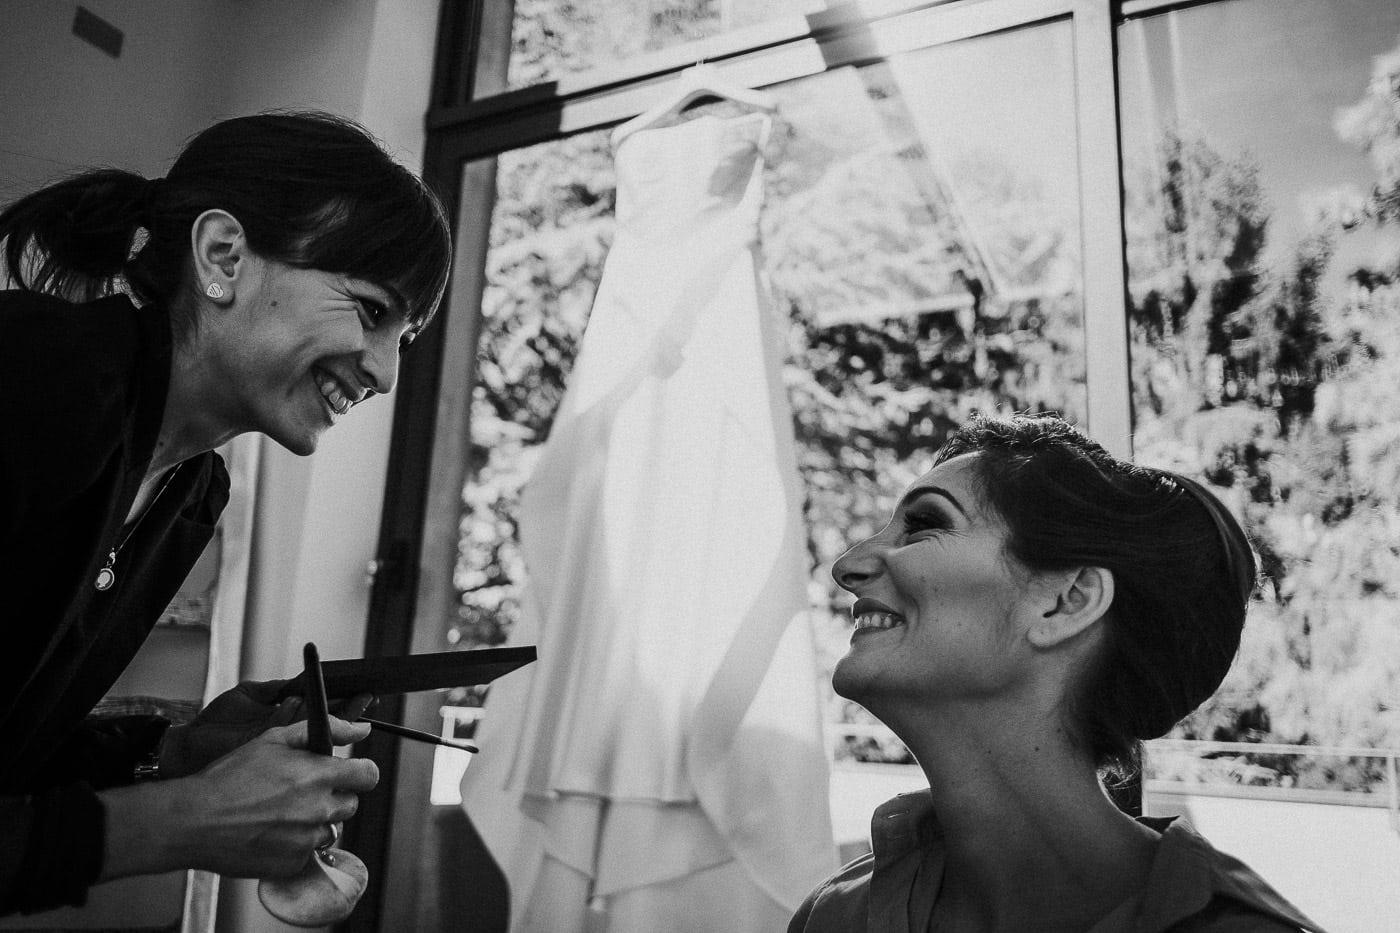 trucco sposa matrimonio_castello durini